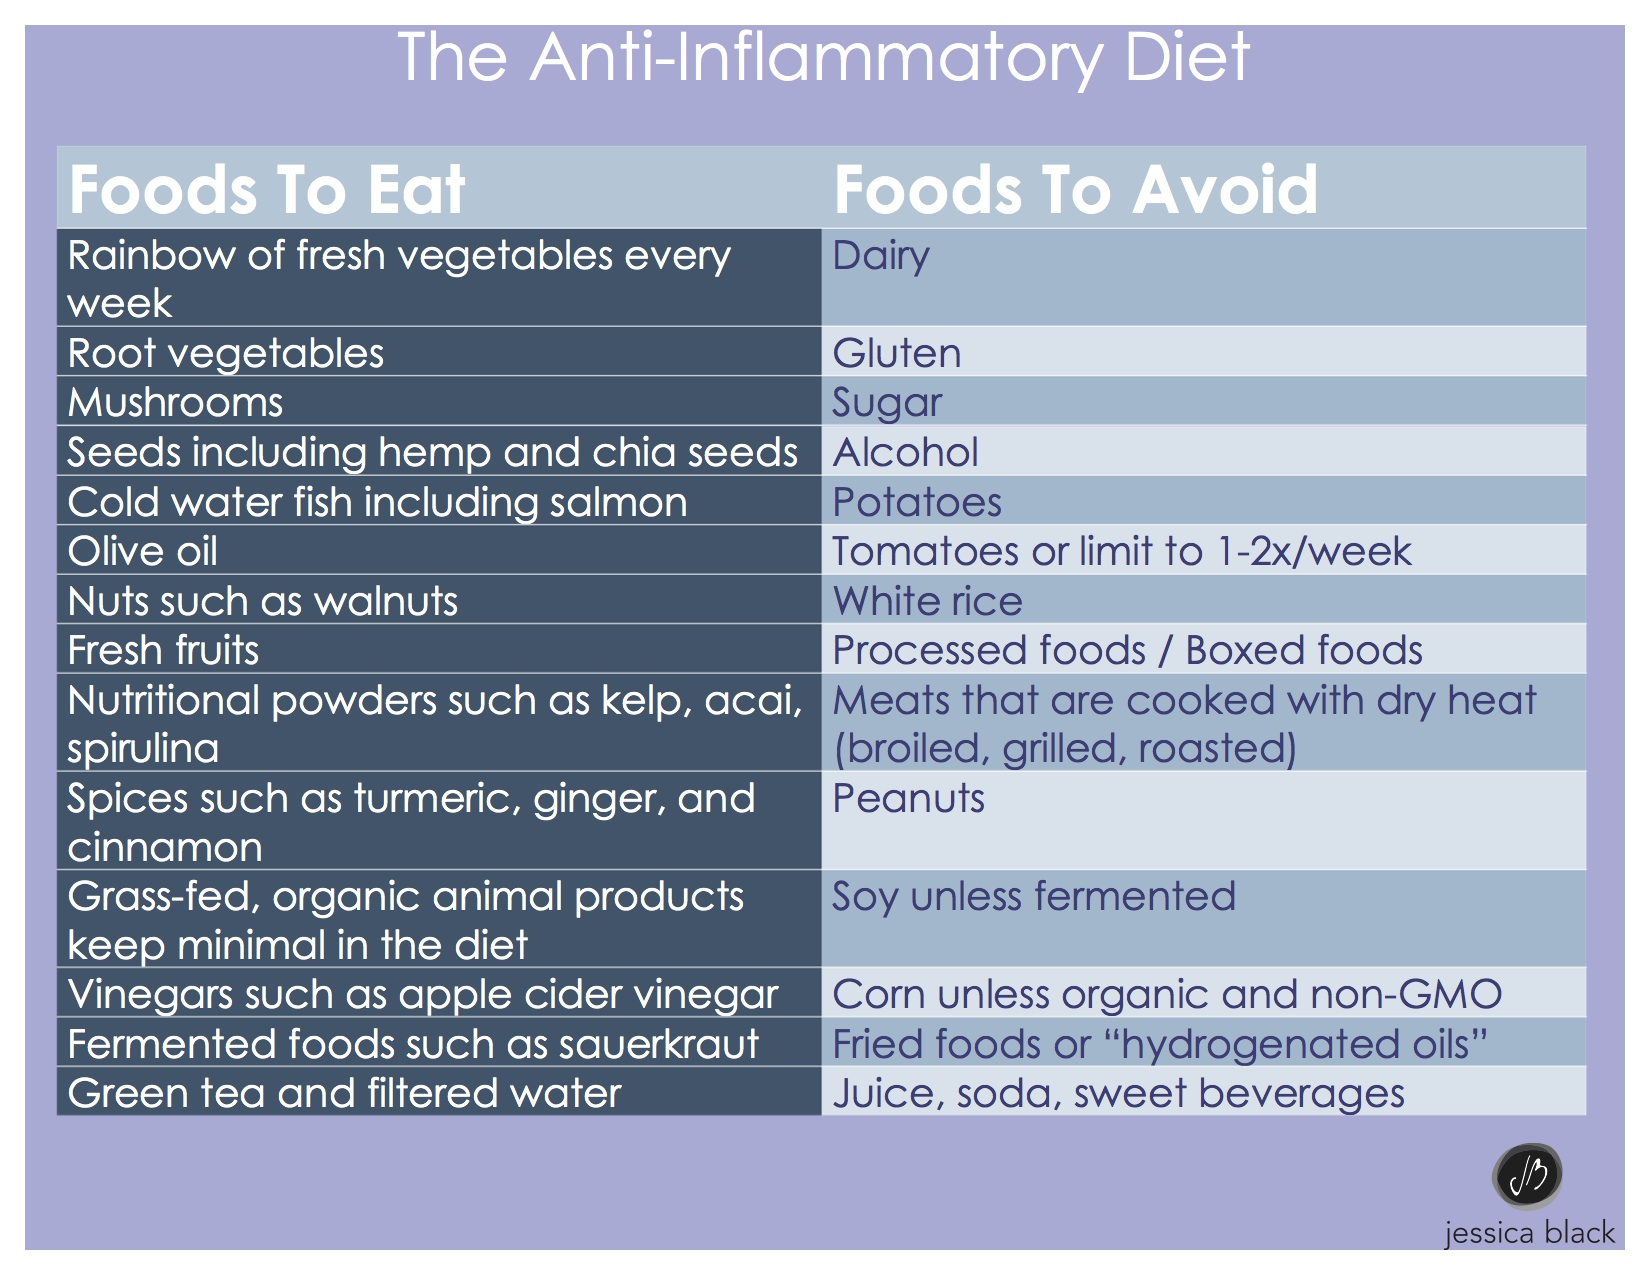 The Anti-Inflammation Diet - Jessica Black